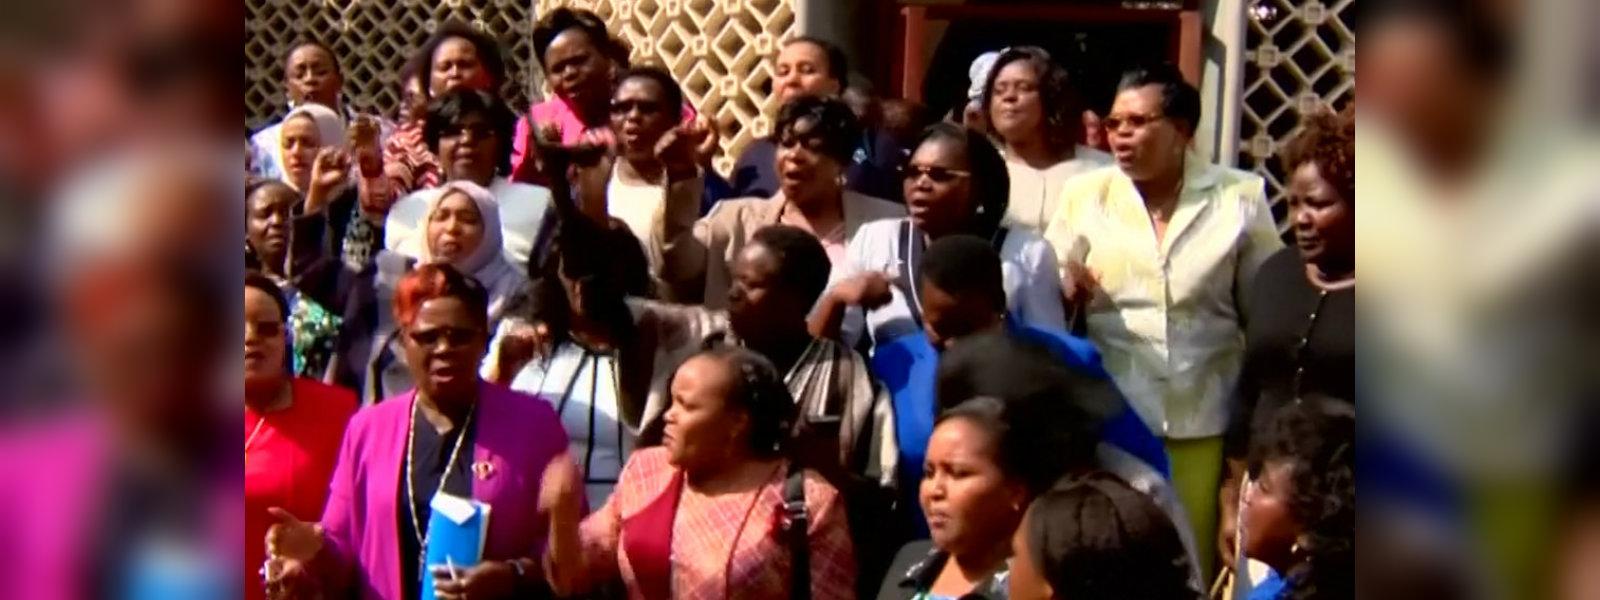 Female lawmakers storm out of Kenyan parliament after legislator assault